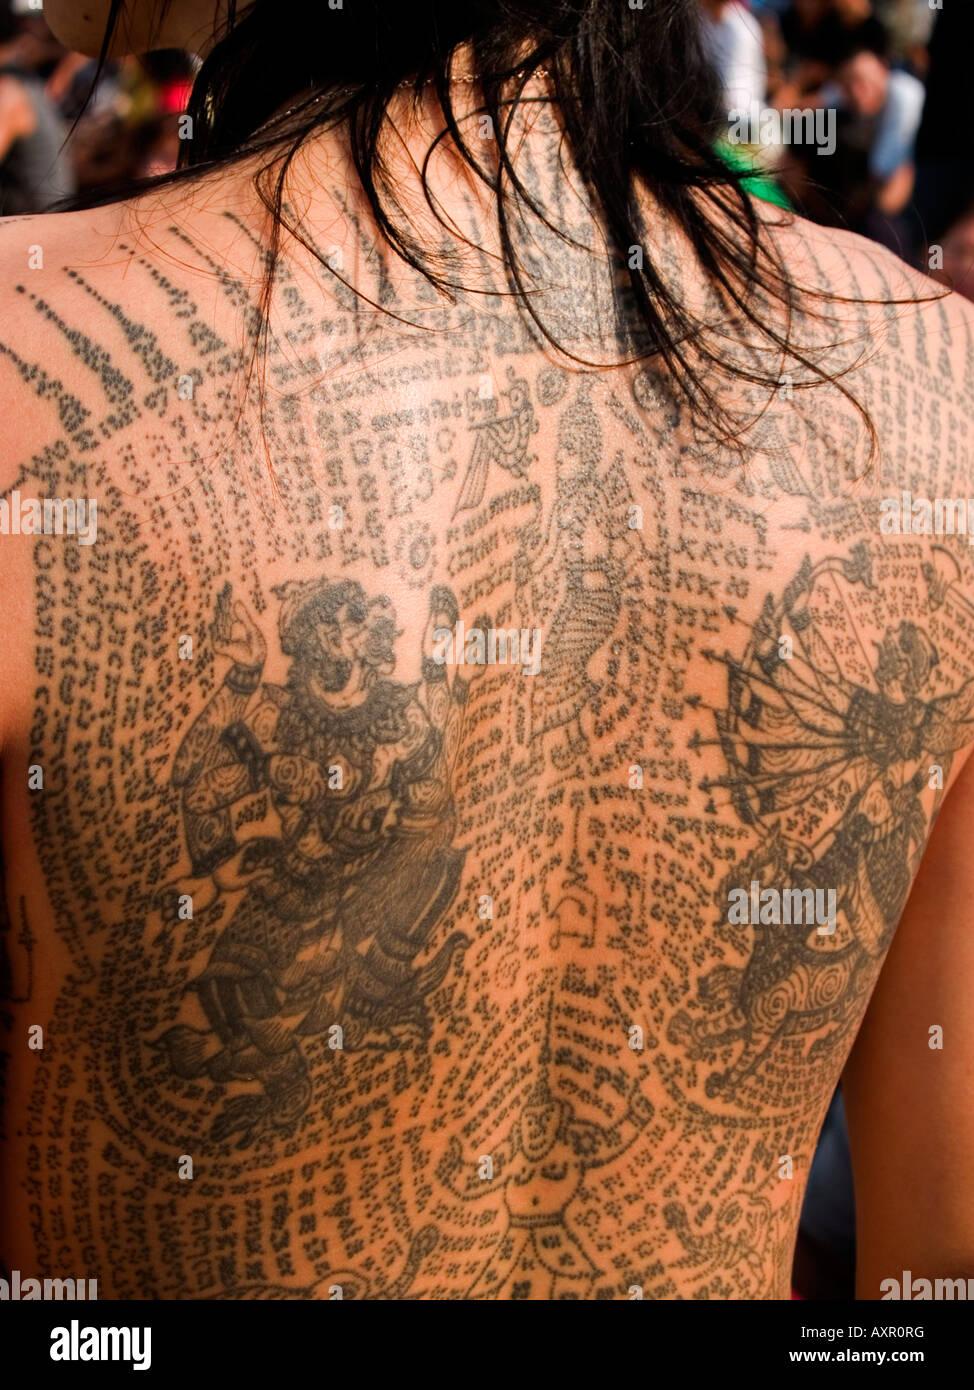 Body Art au Wat Bang Phra festival tattoo mystique en Thaïlande Photo Stock